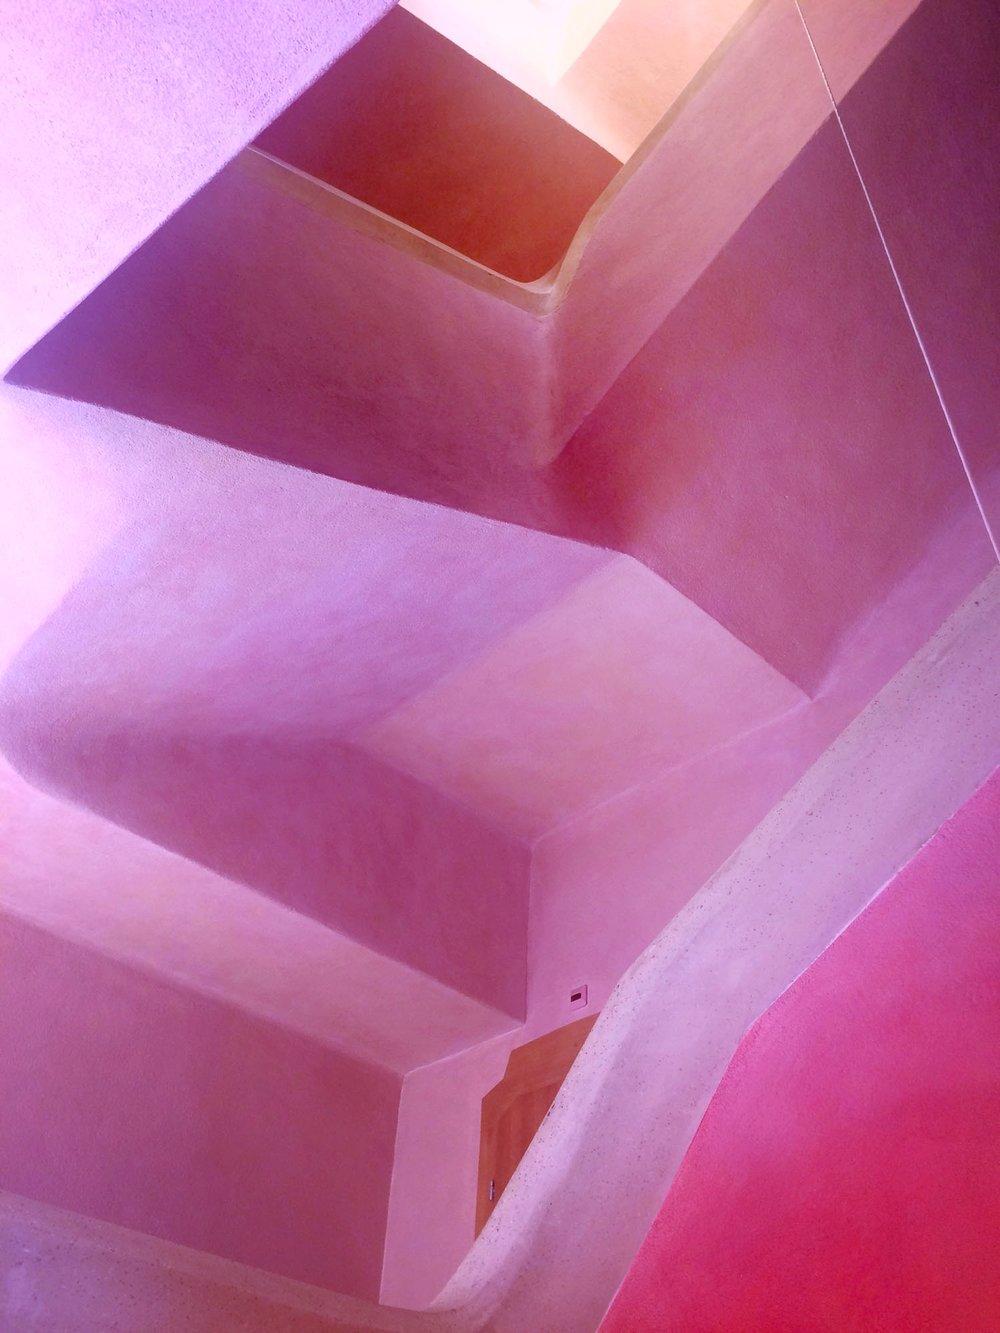 Goetheanum, cage d'escalier sud